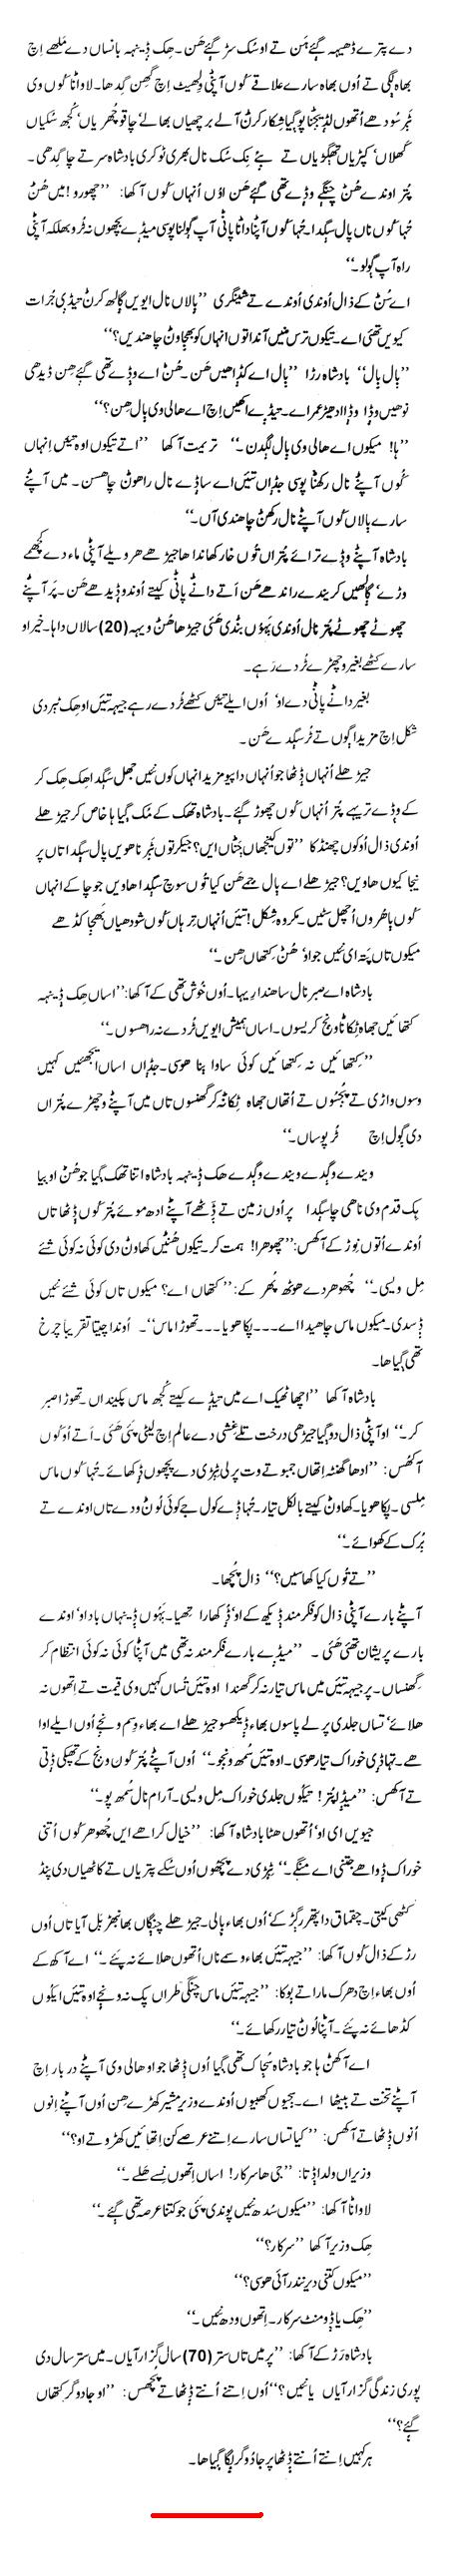 Seraiki Afsana Lawanra (R.K.Narian translator Azhar Lashari) Part-4